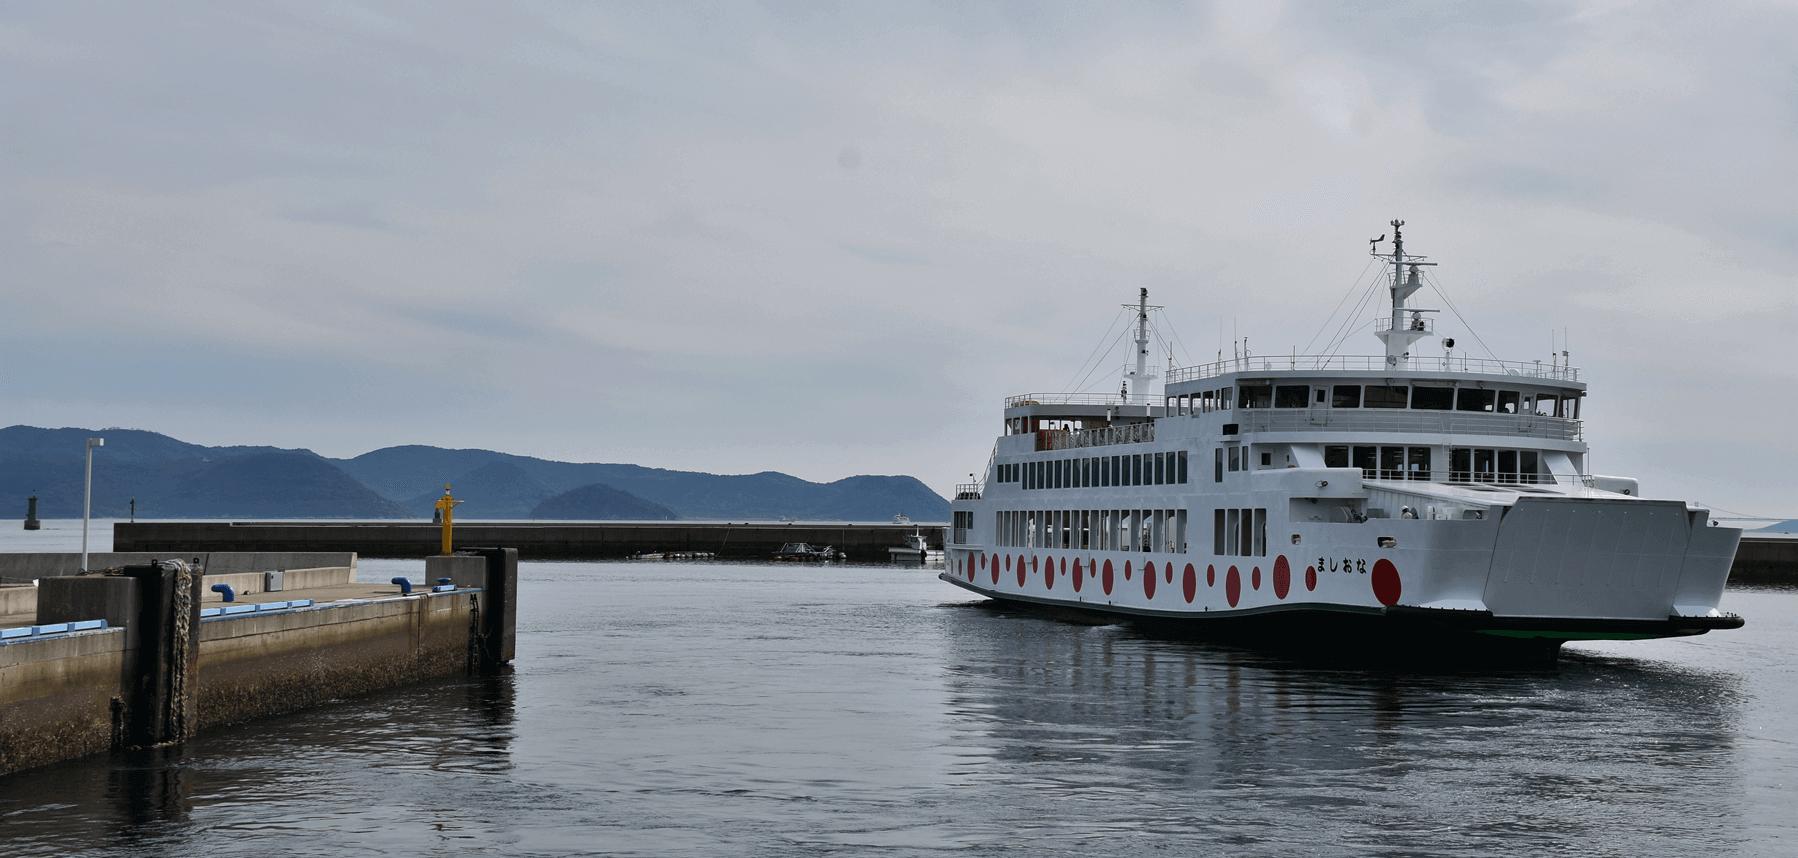 Ferry to Naoshima Island, Japan